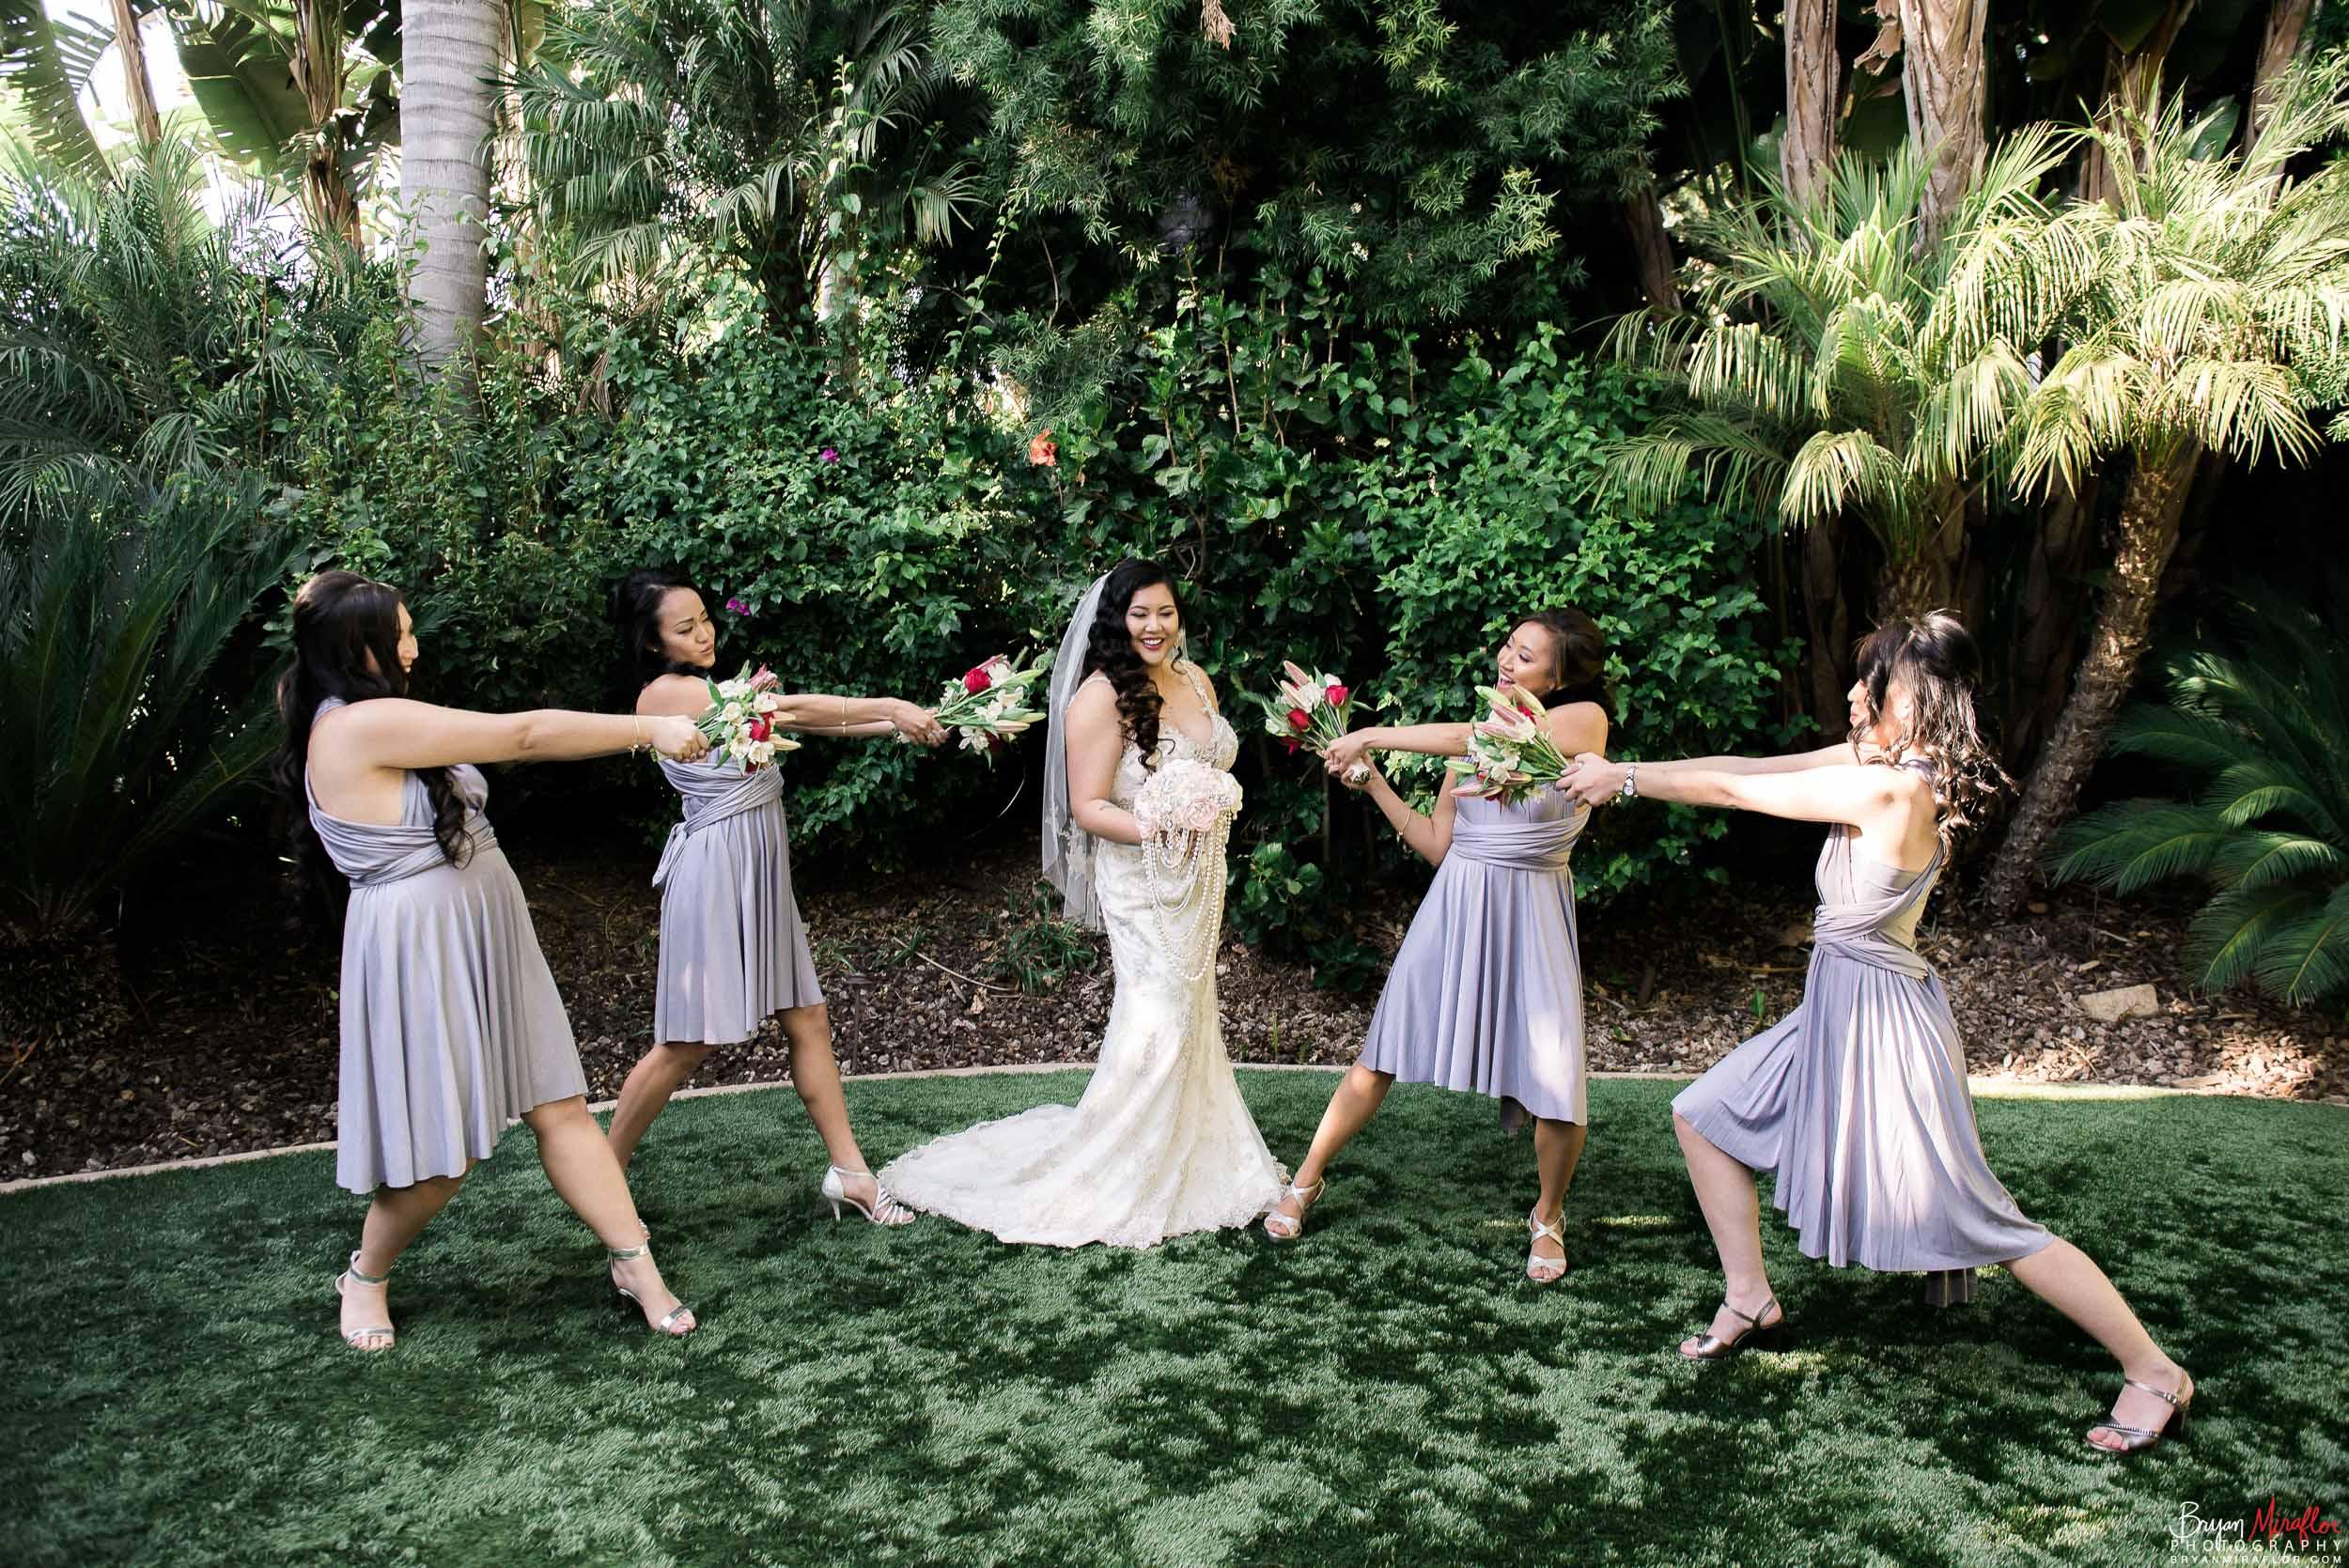 Bryan-Miraflor-Photography-Hannah-Jonathan-Married-Grand-Traditions-Estate-Gardens-Fallbrook-20171222-113.jpg